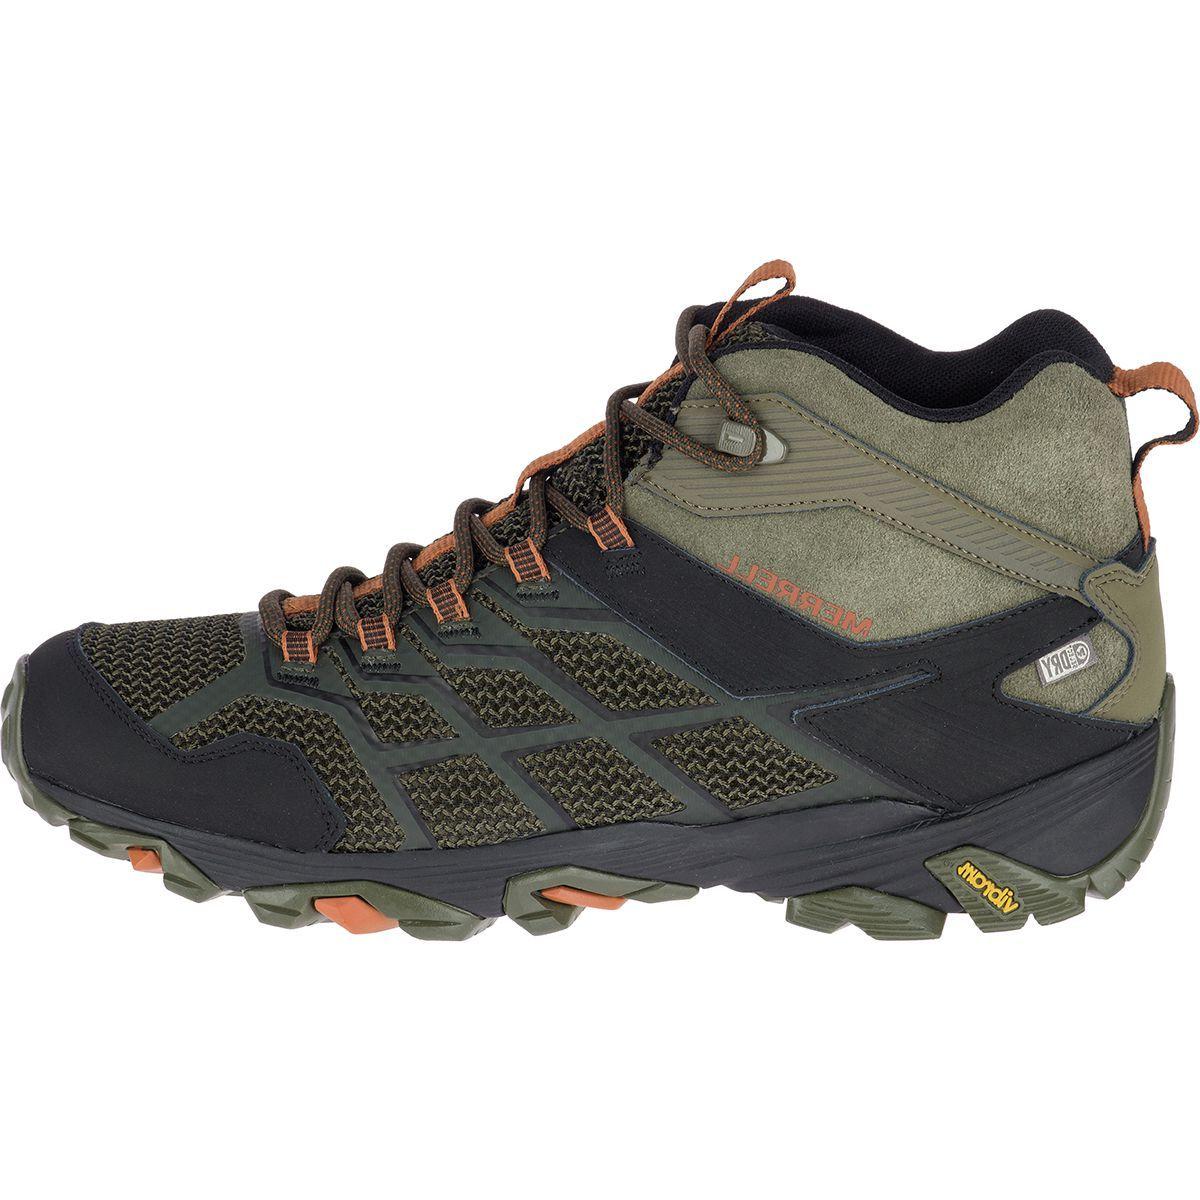 Merrell Moab FST 2 Mid Waterproof Boot - Men's